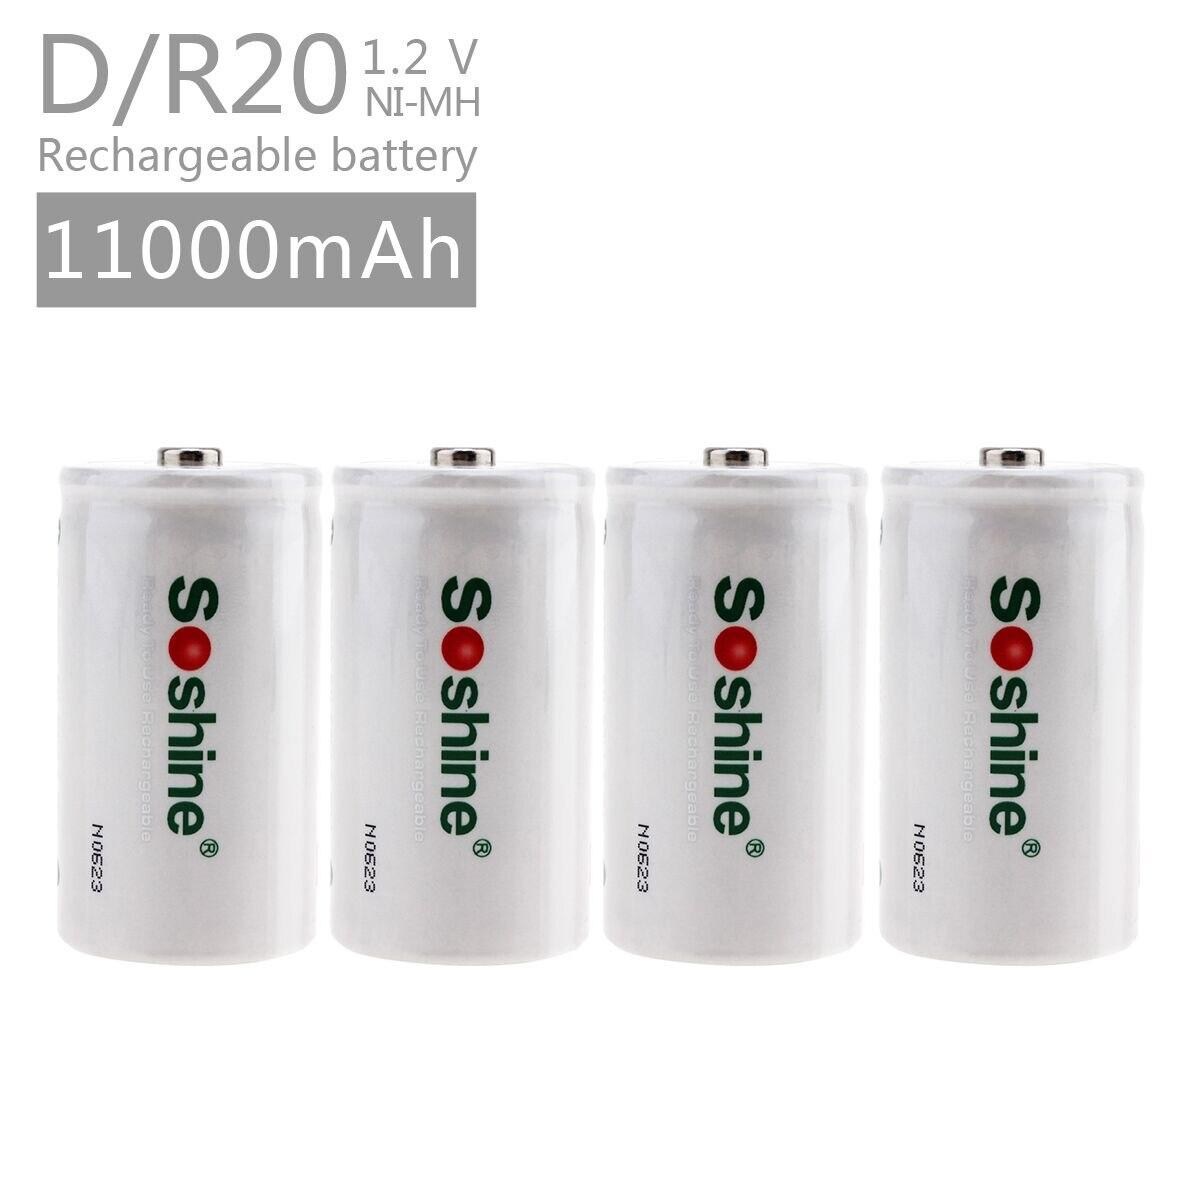 Soshine 4 unids/set D/R20 tamaño baterías recargables NiMH 11000 mAh batería con mayor capacidad actual